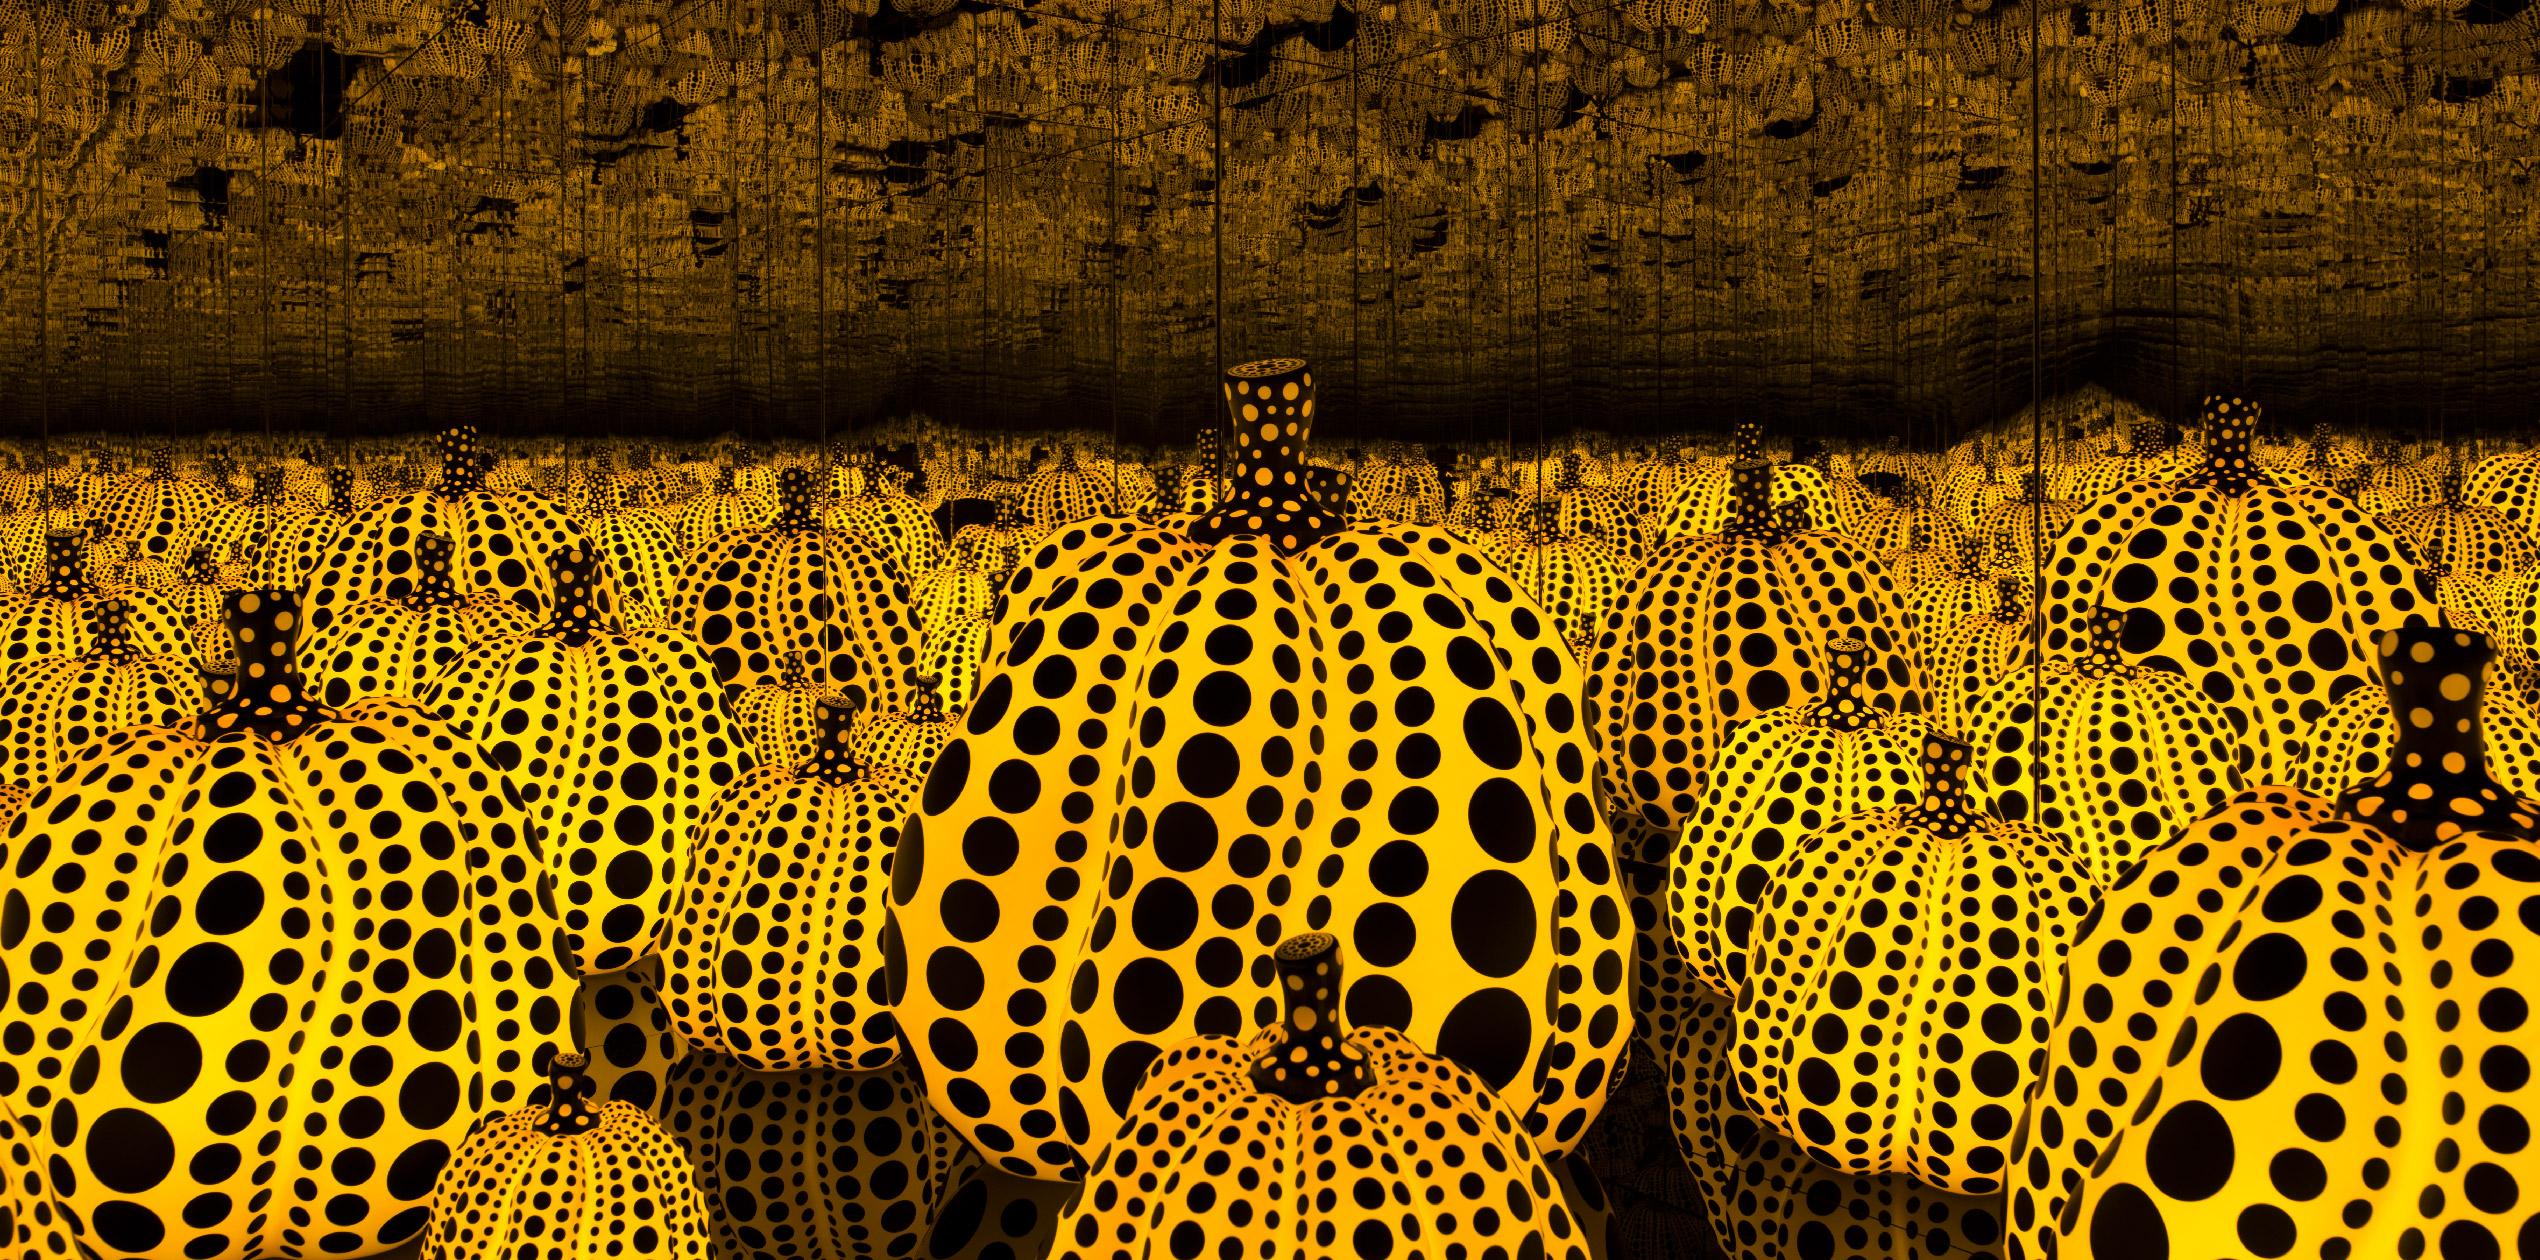 Yayoi Kusama - The queen of polka dots